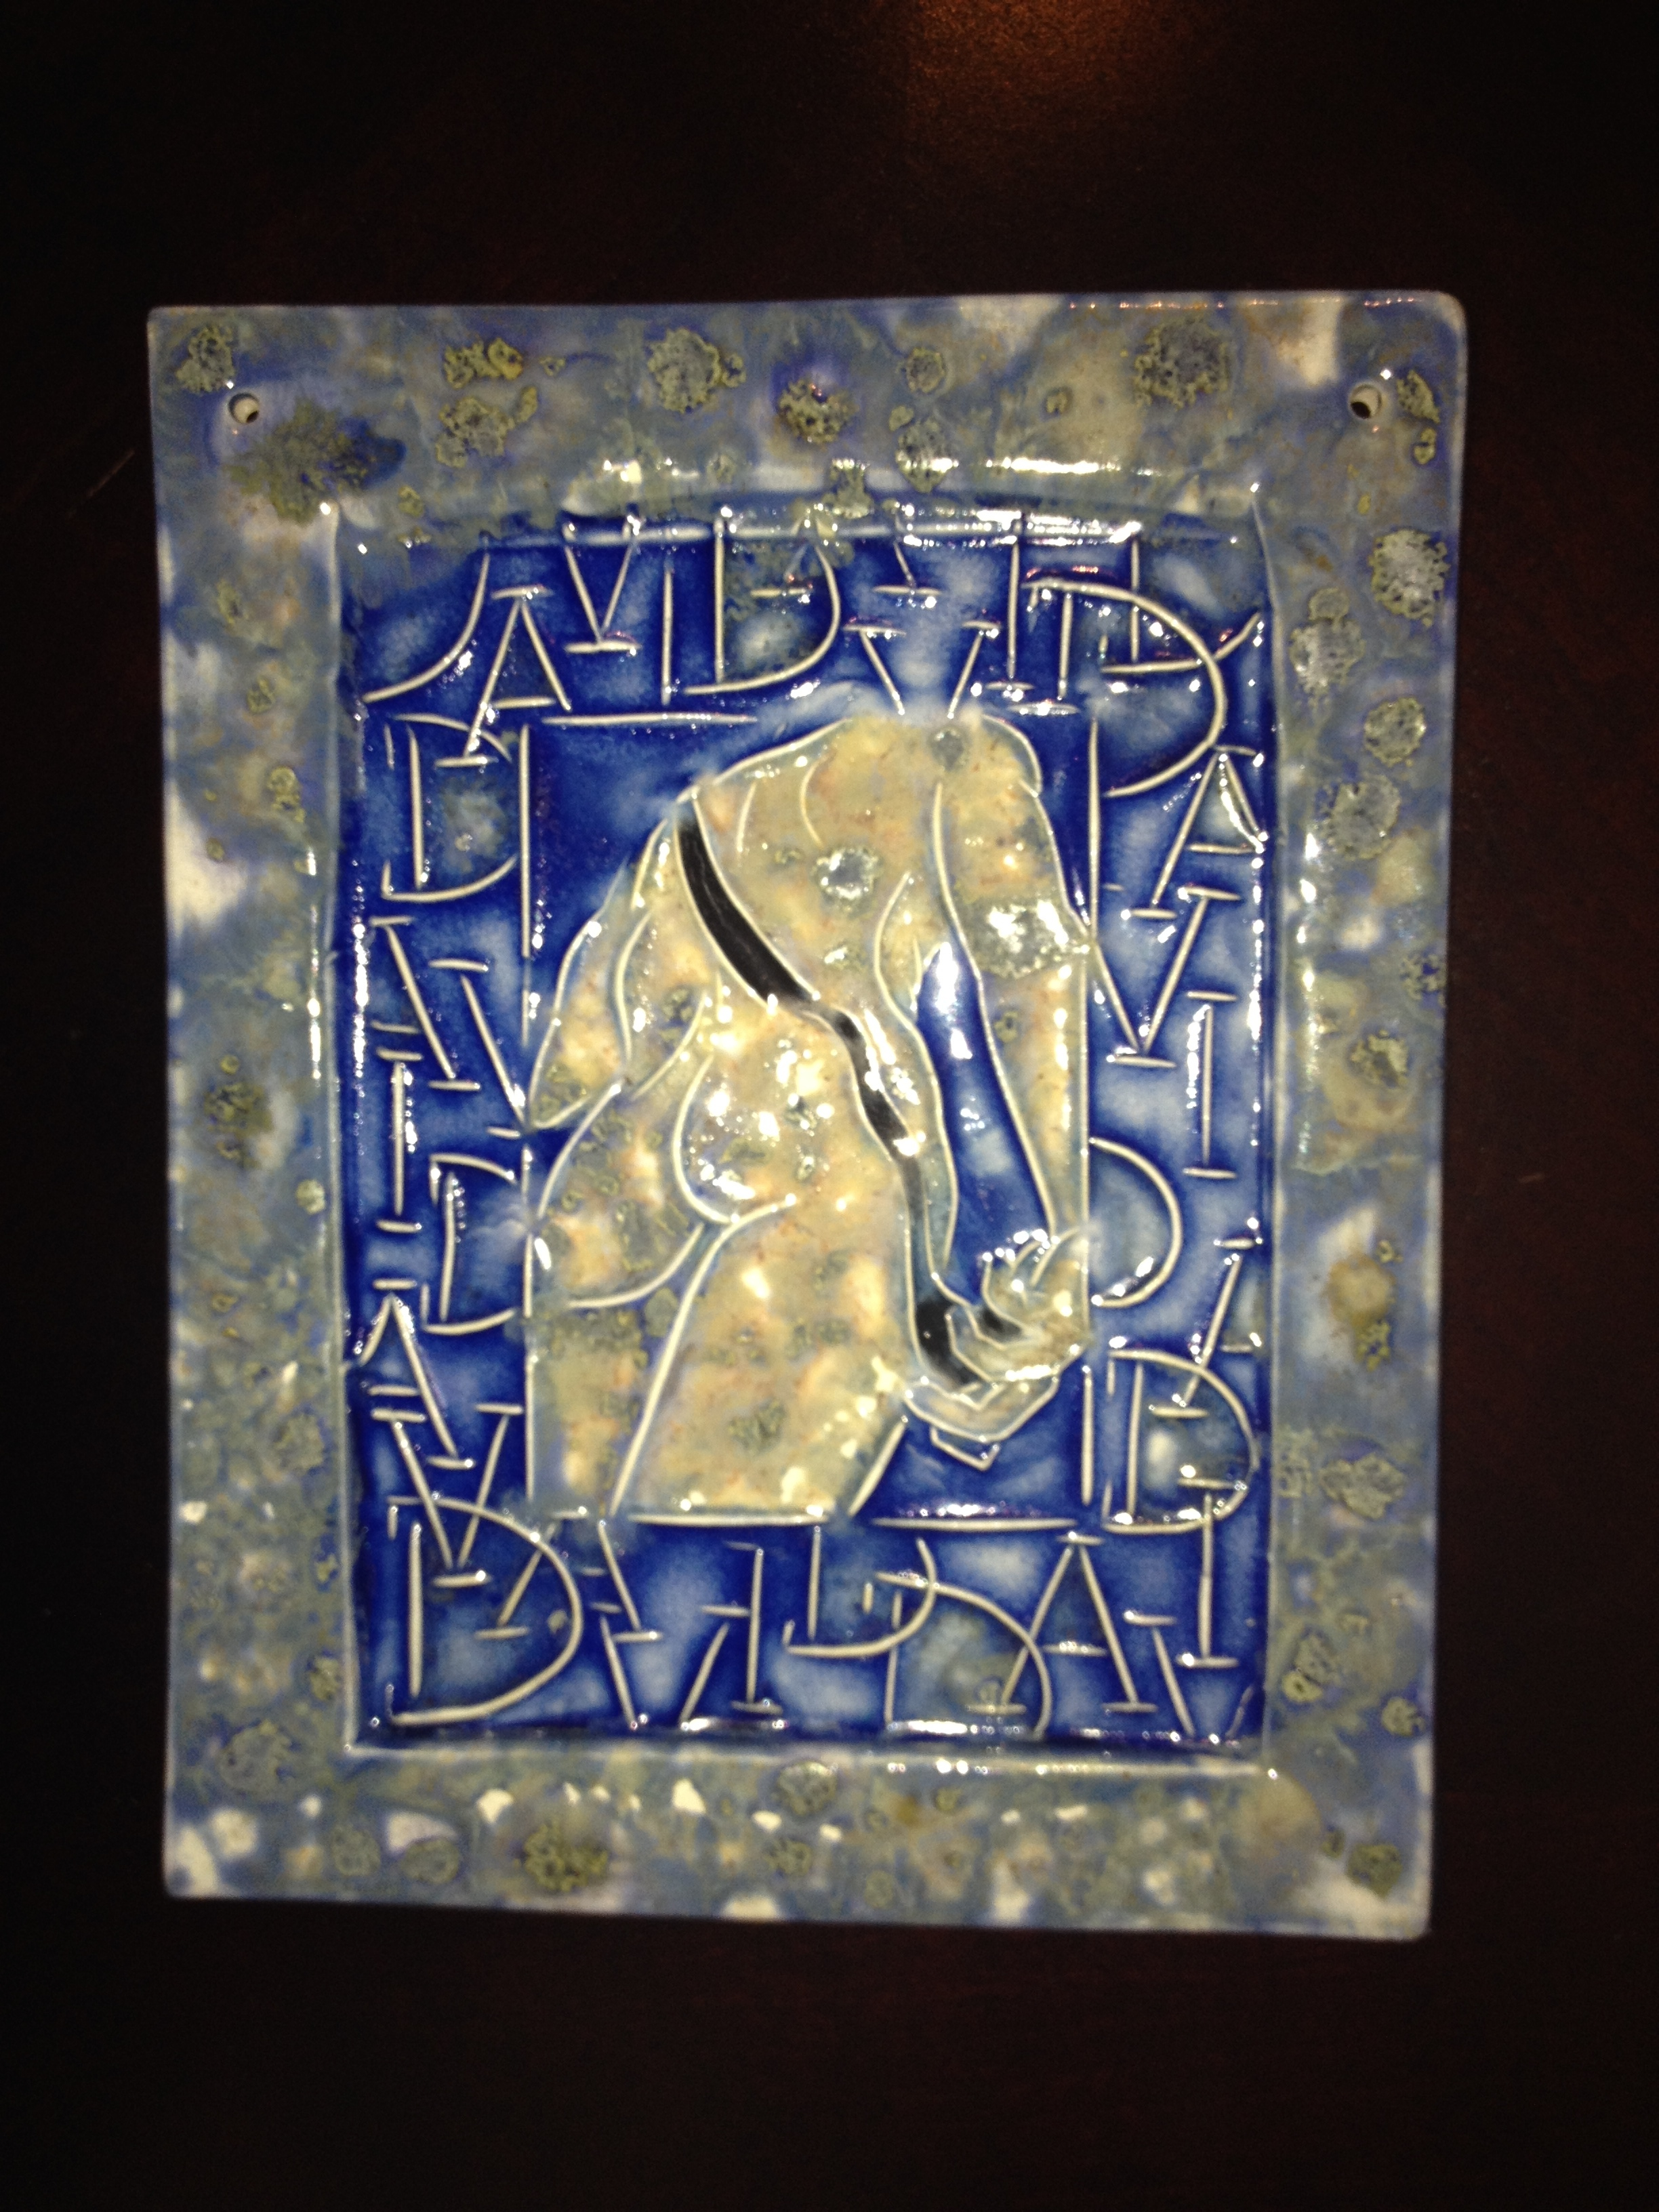 David, ceramic